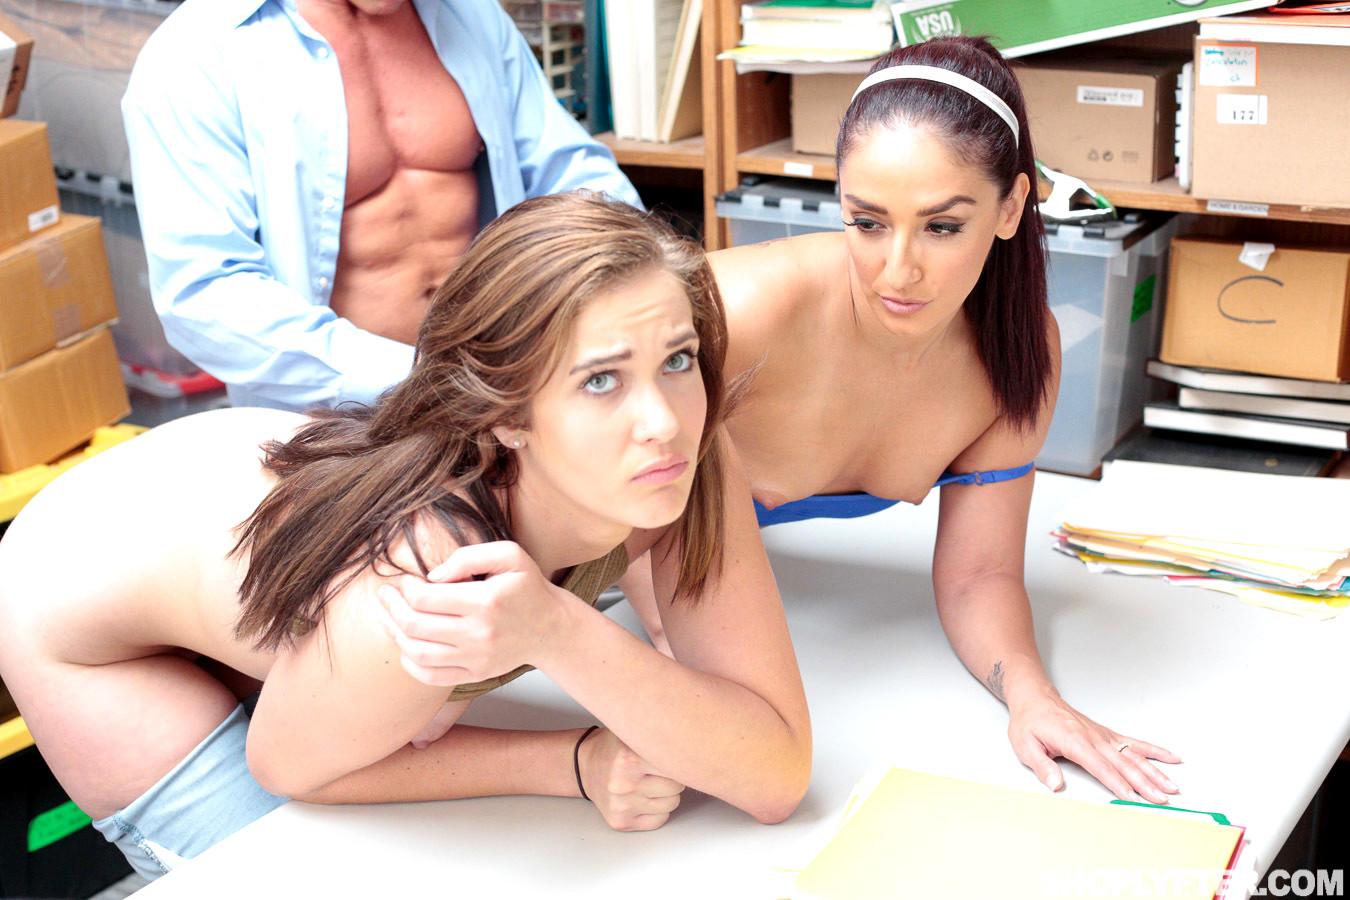 Peyton robbie threesome sex photo